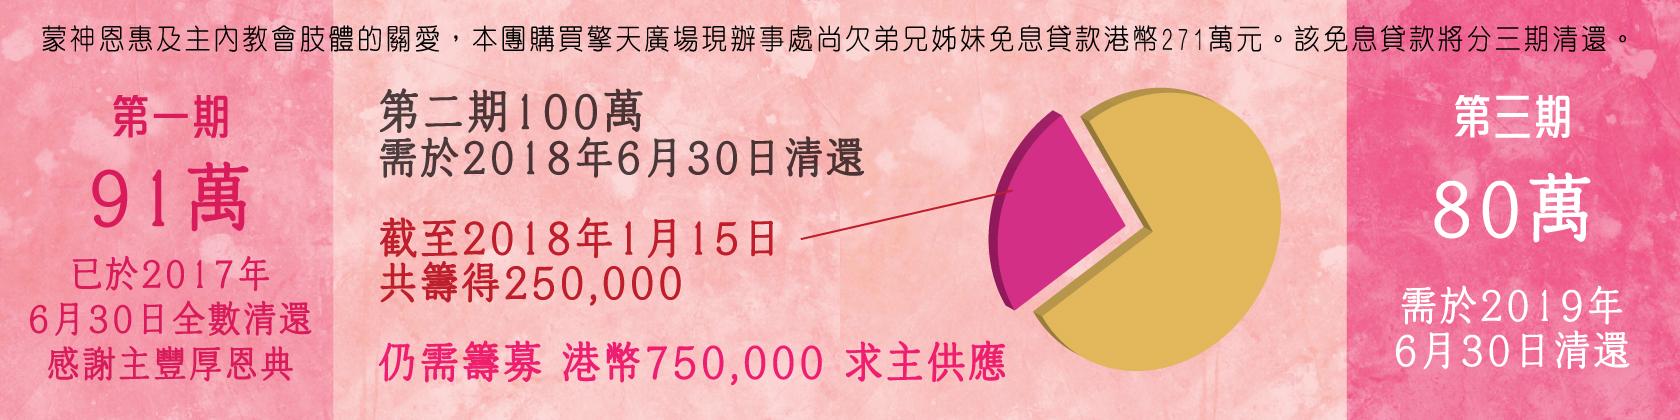 CB-02-web-banner-1680-x-420-05-1